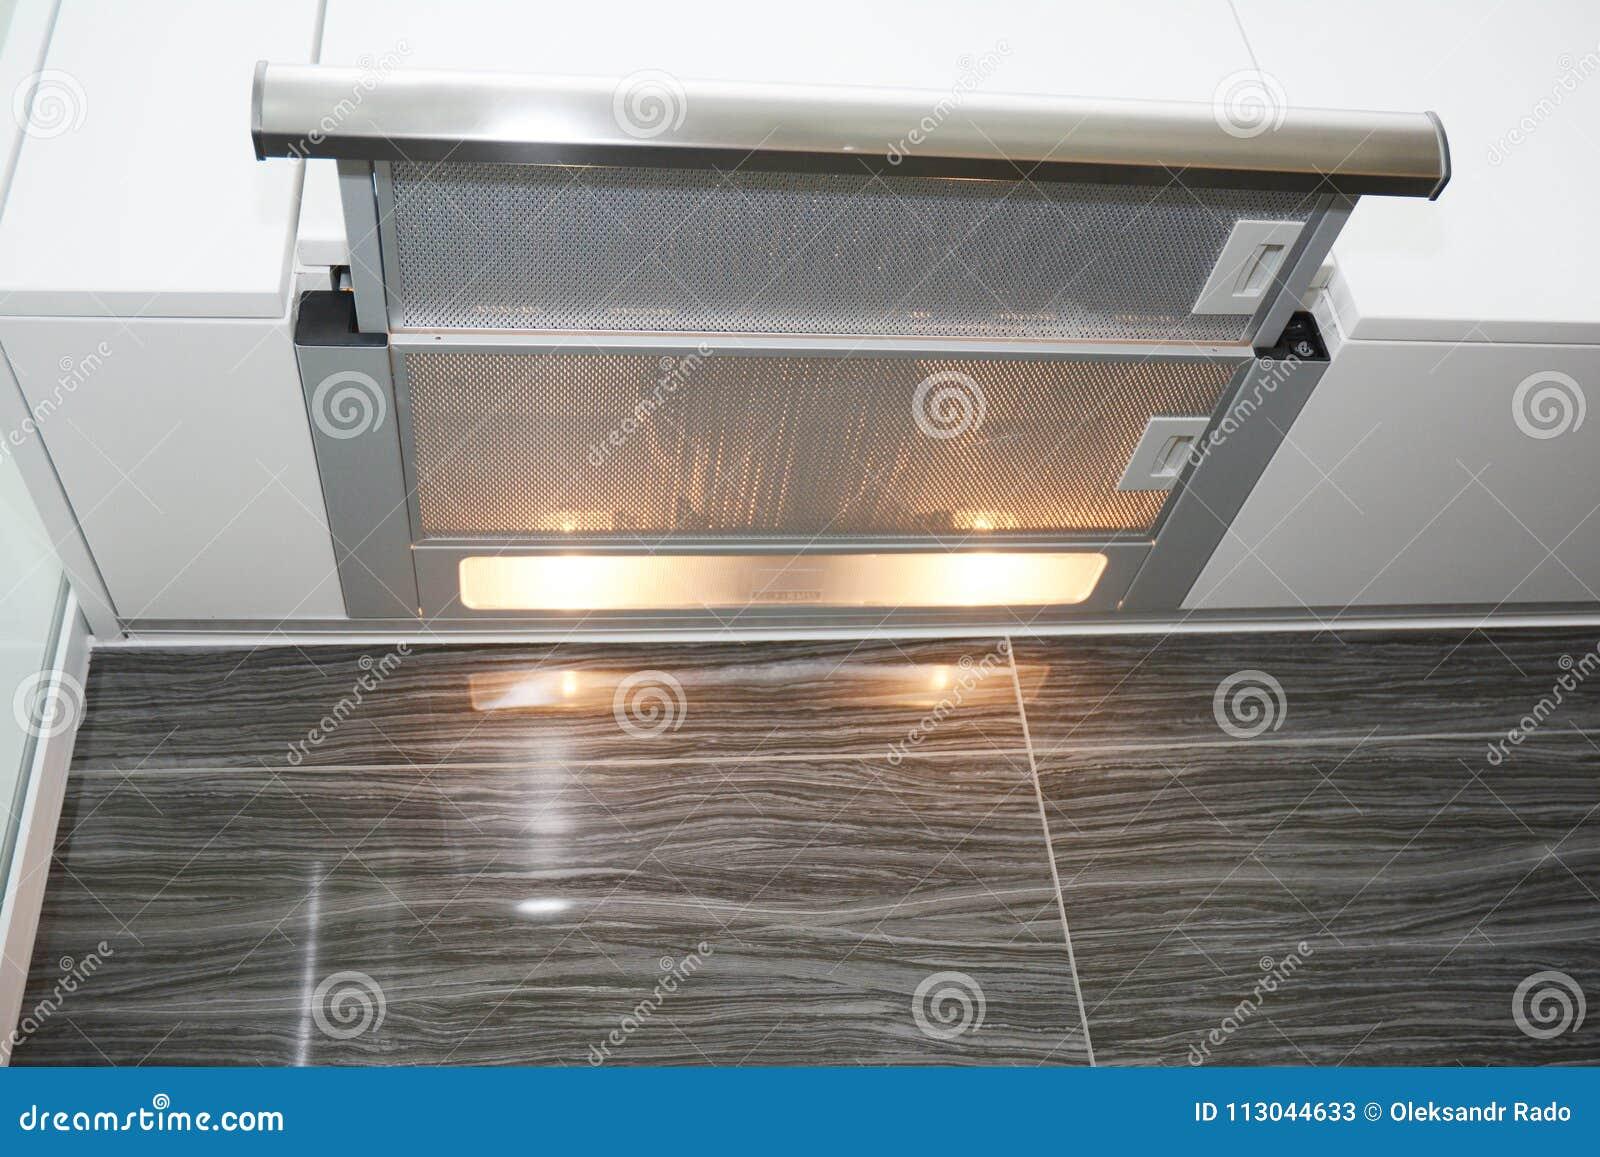 Moderner luftlüfterküche fan oder dunstabzugshaube edelstahl kamin